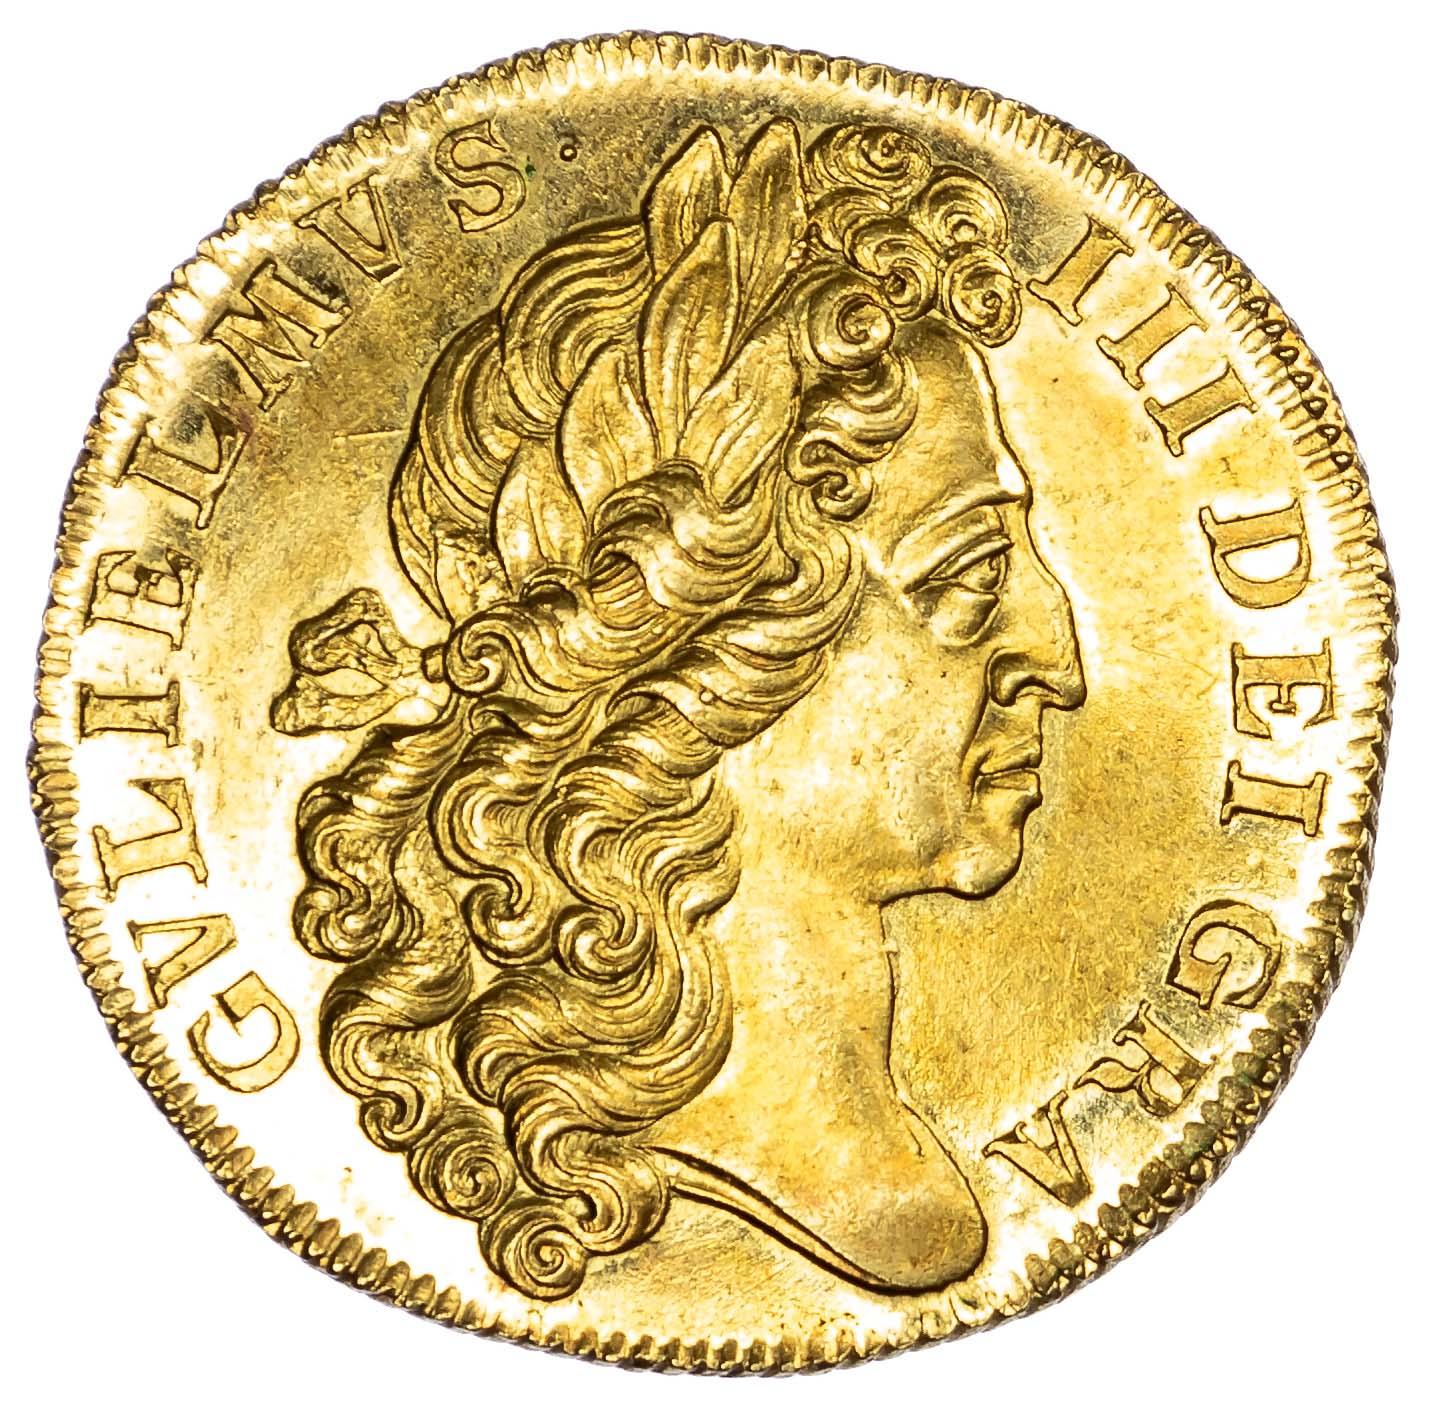 William III (1694-1702), 'Fine-Work' Two-Guineas, 1701